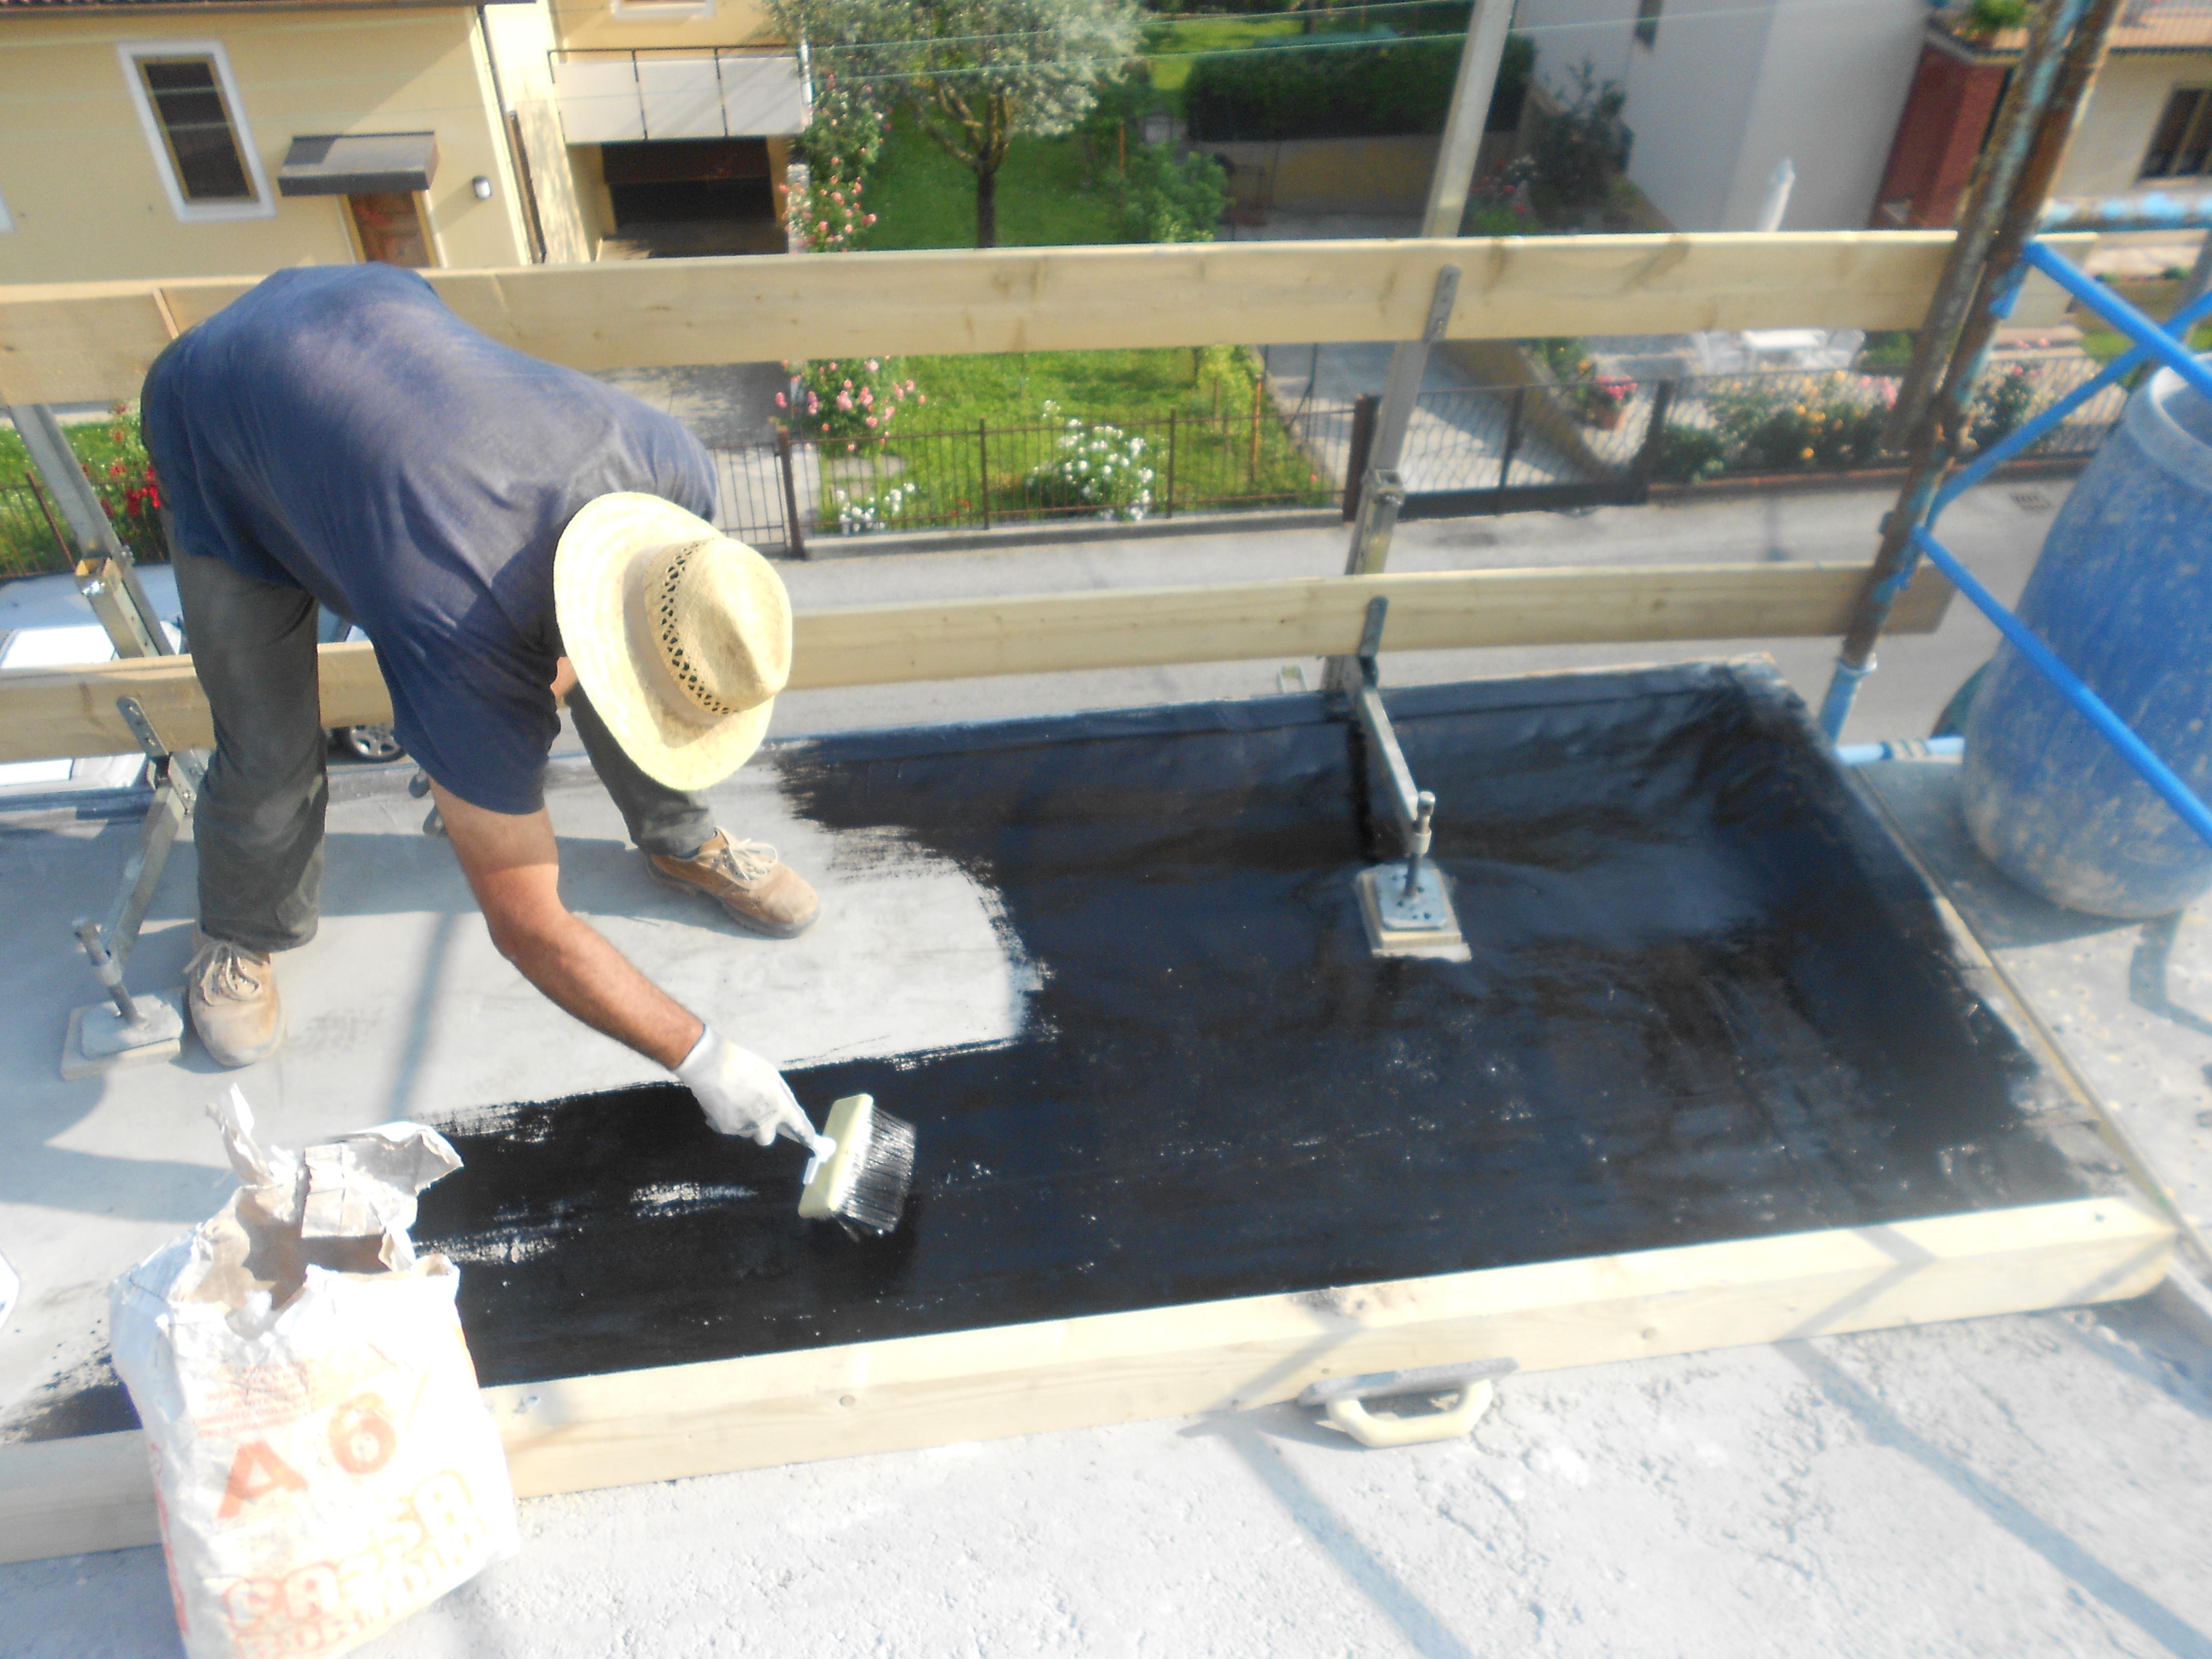 impermeabilizzazione copertura manutenzione ordinaria